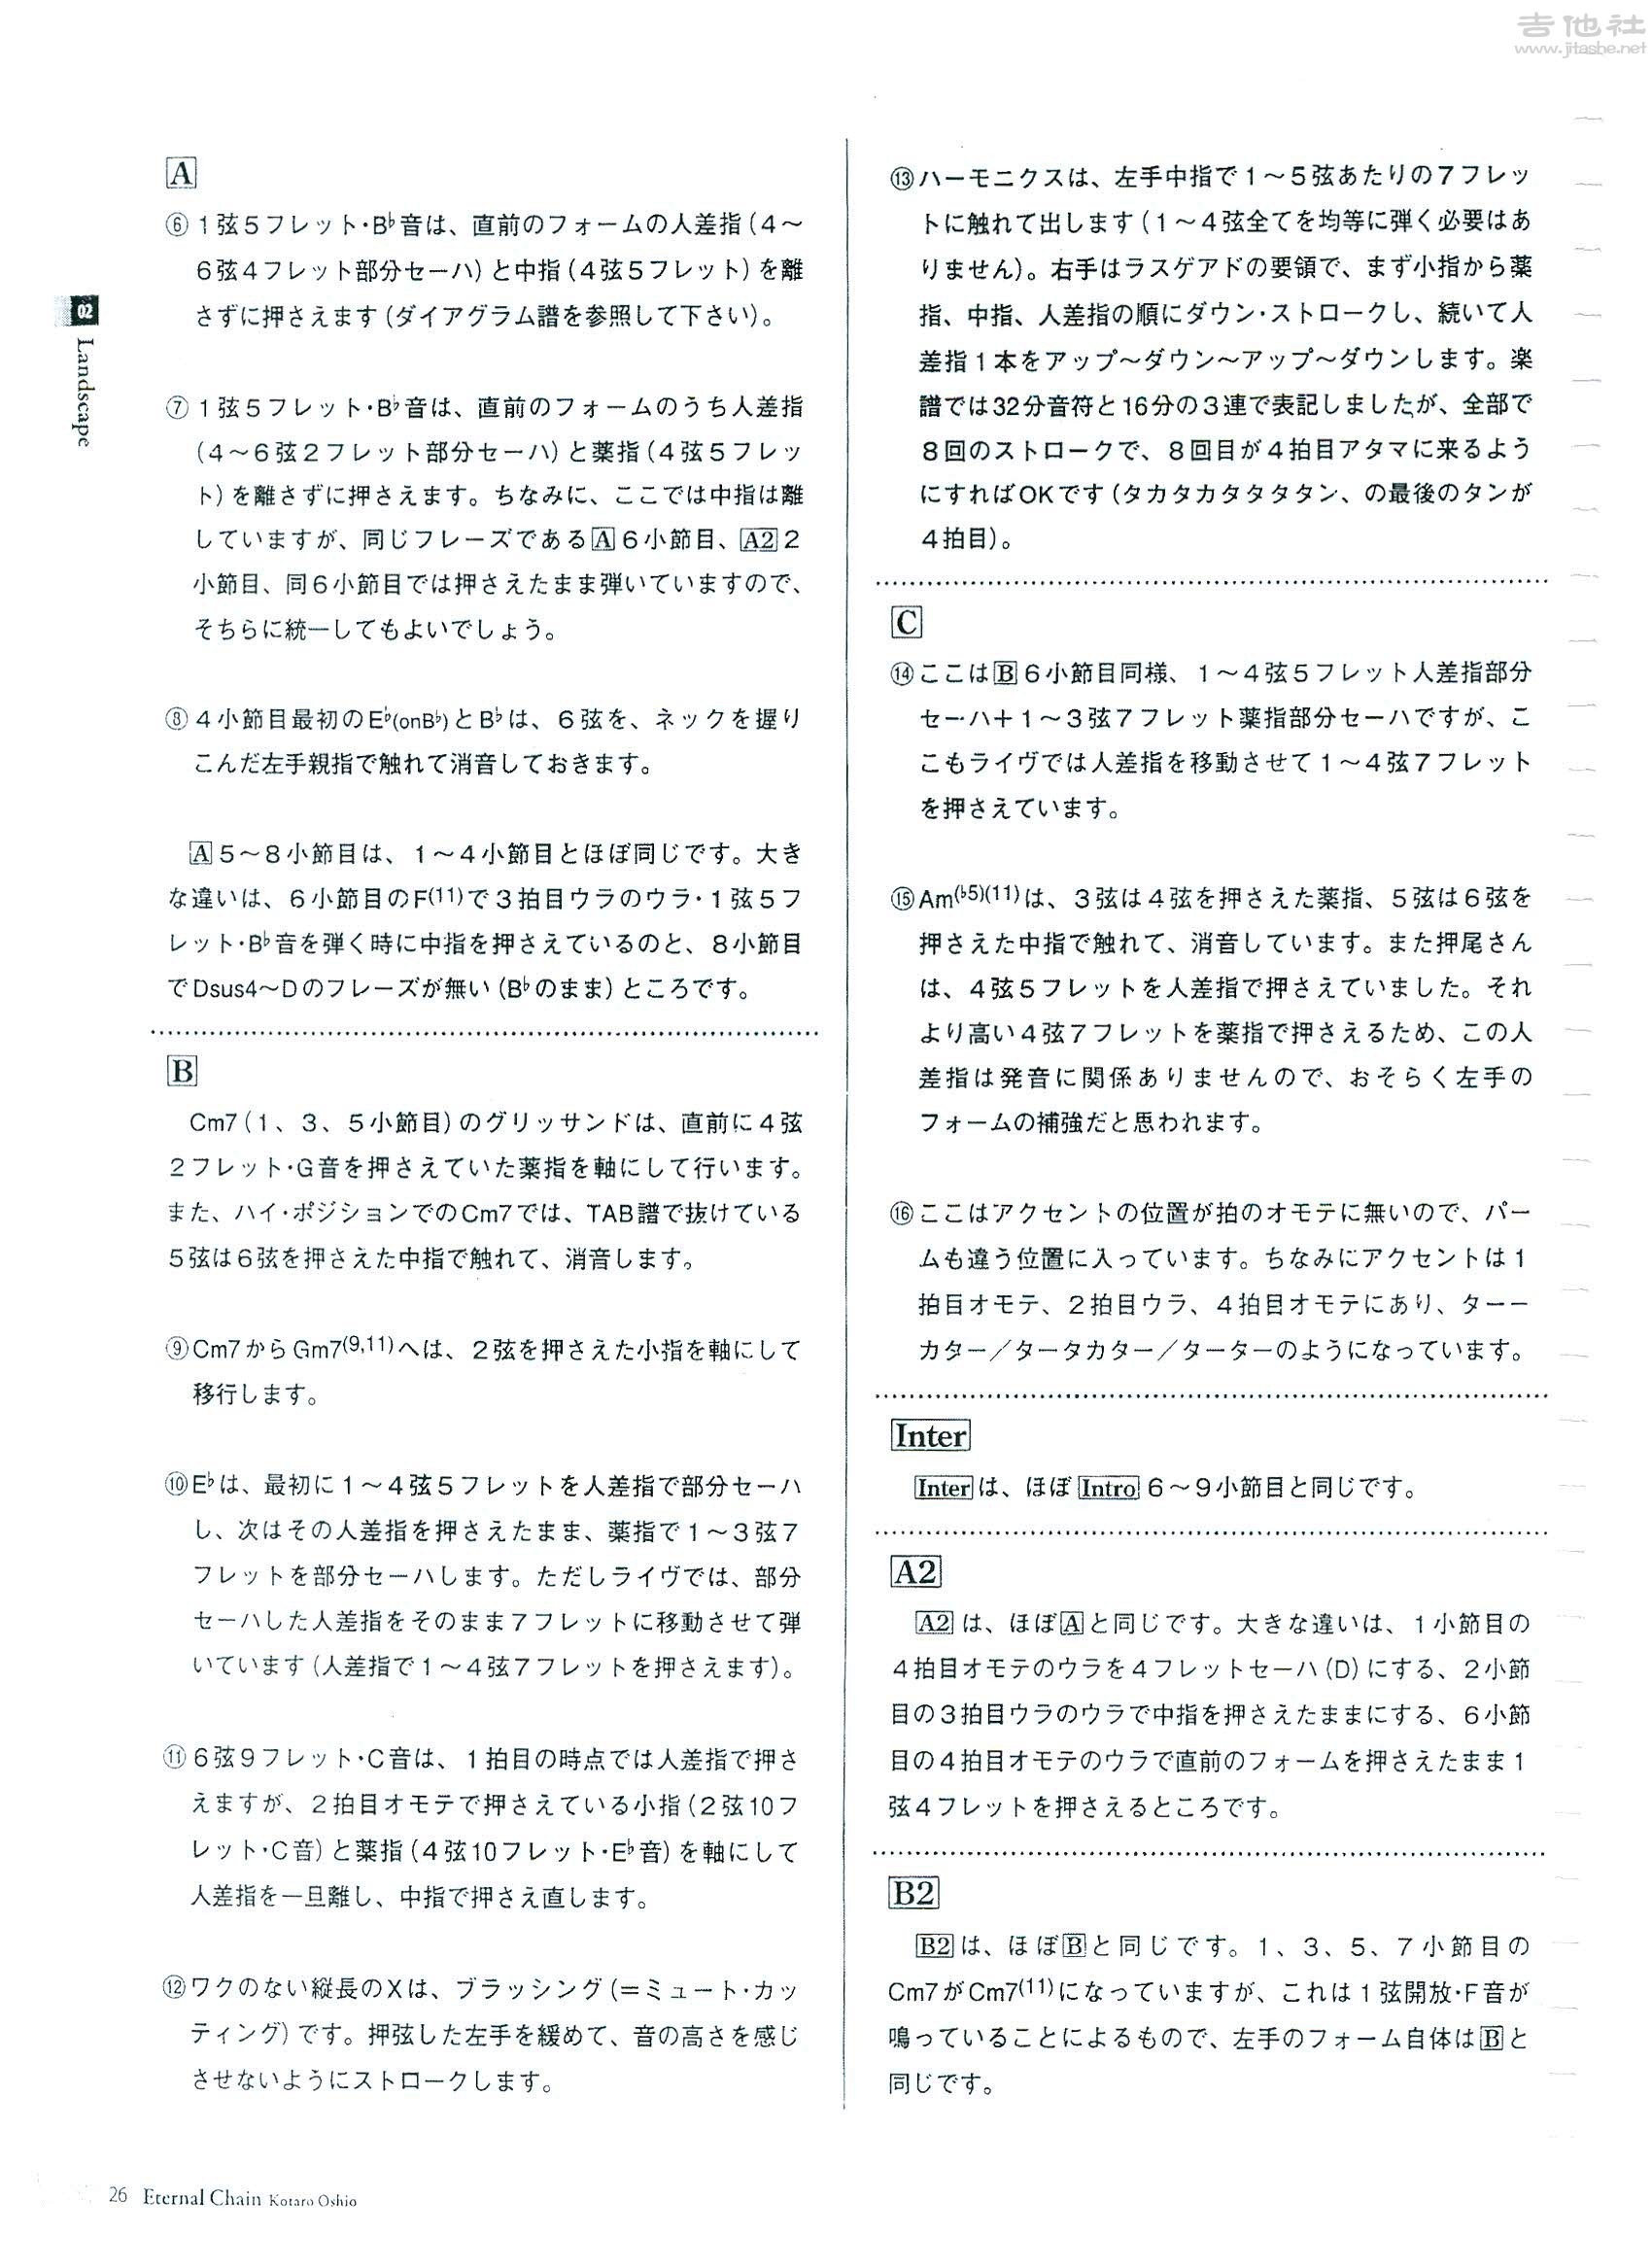 landscape吉他谱(图片谱,指弹,原版)_押尾桑(Kotaro Oshio;押尾光太郎)_Landscape-11.jpg